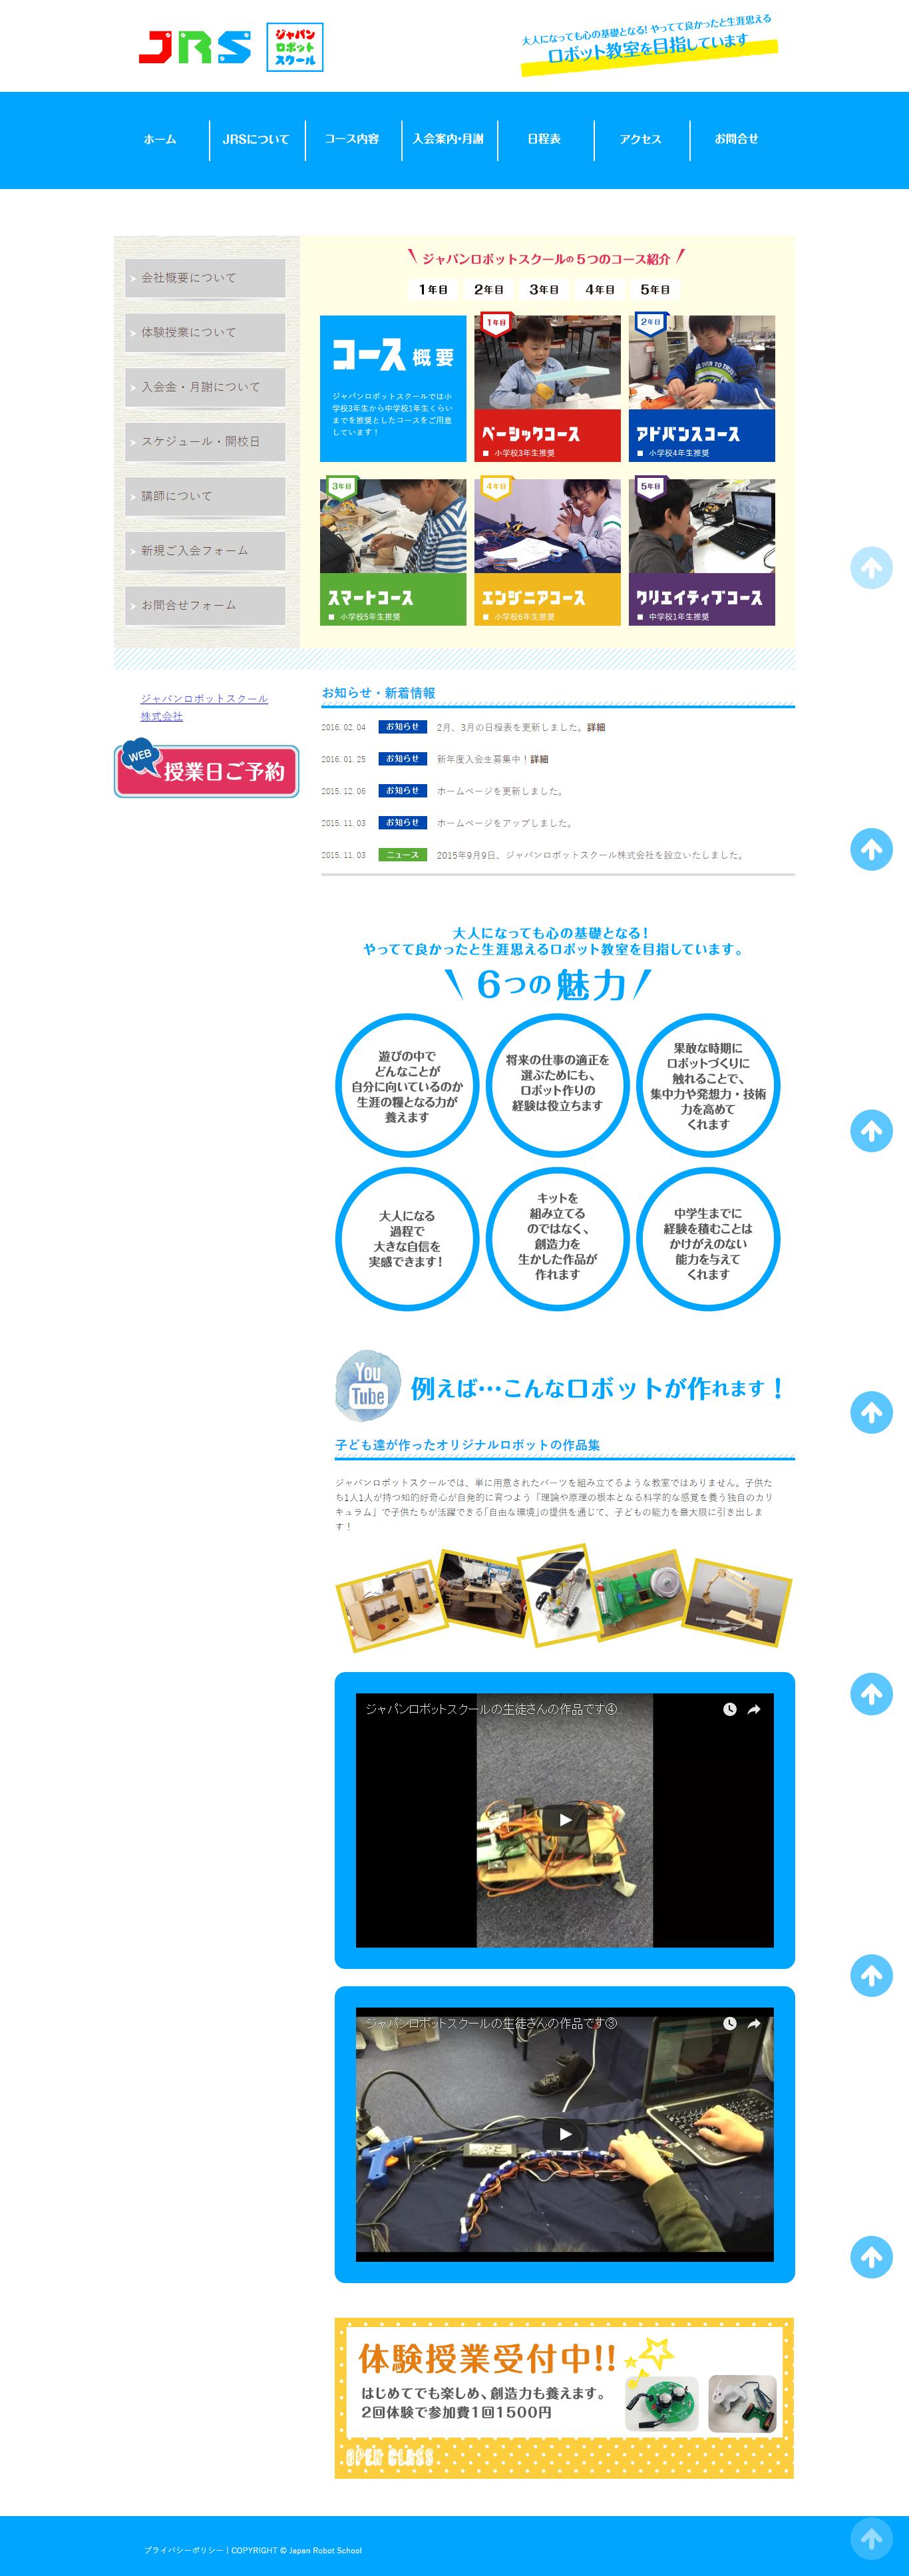 screencapture-file-I-NEC_2016_0109-robotschool-jp-2016_0224_-E3-82-A2-E3-82-B8-E3-82-A2-E3-83-96-E3-83-AC-E3-82-A4-E3-83-B3-E6-A7-98-E3-81-B8-E3-81-94-E7-9B-B8-E8-AB-87-index-html-1456631010099